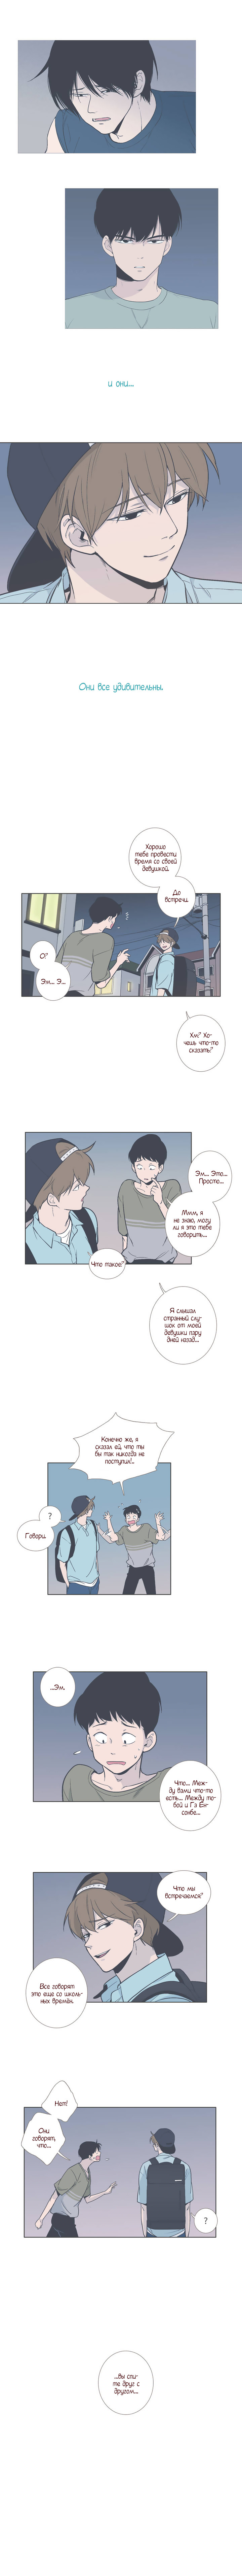 https://r1.ninemanga.com/comics/pic2/12/22860/344421/1512081513170.jpg Page 4